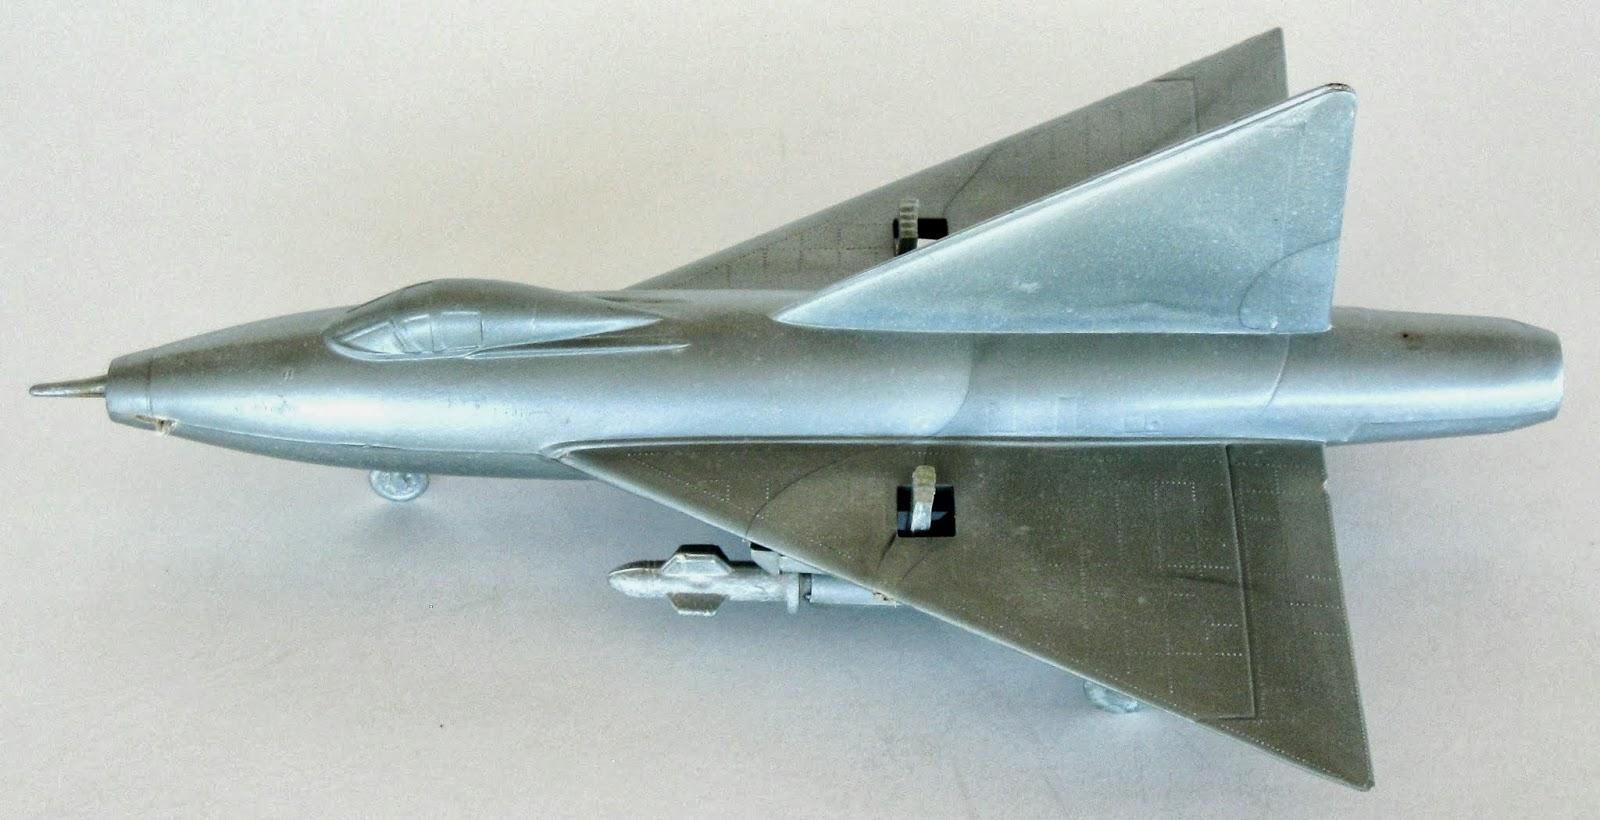 Toys and Stuff: Marx XF-92 Convair Dart